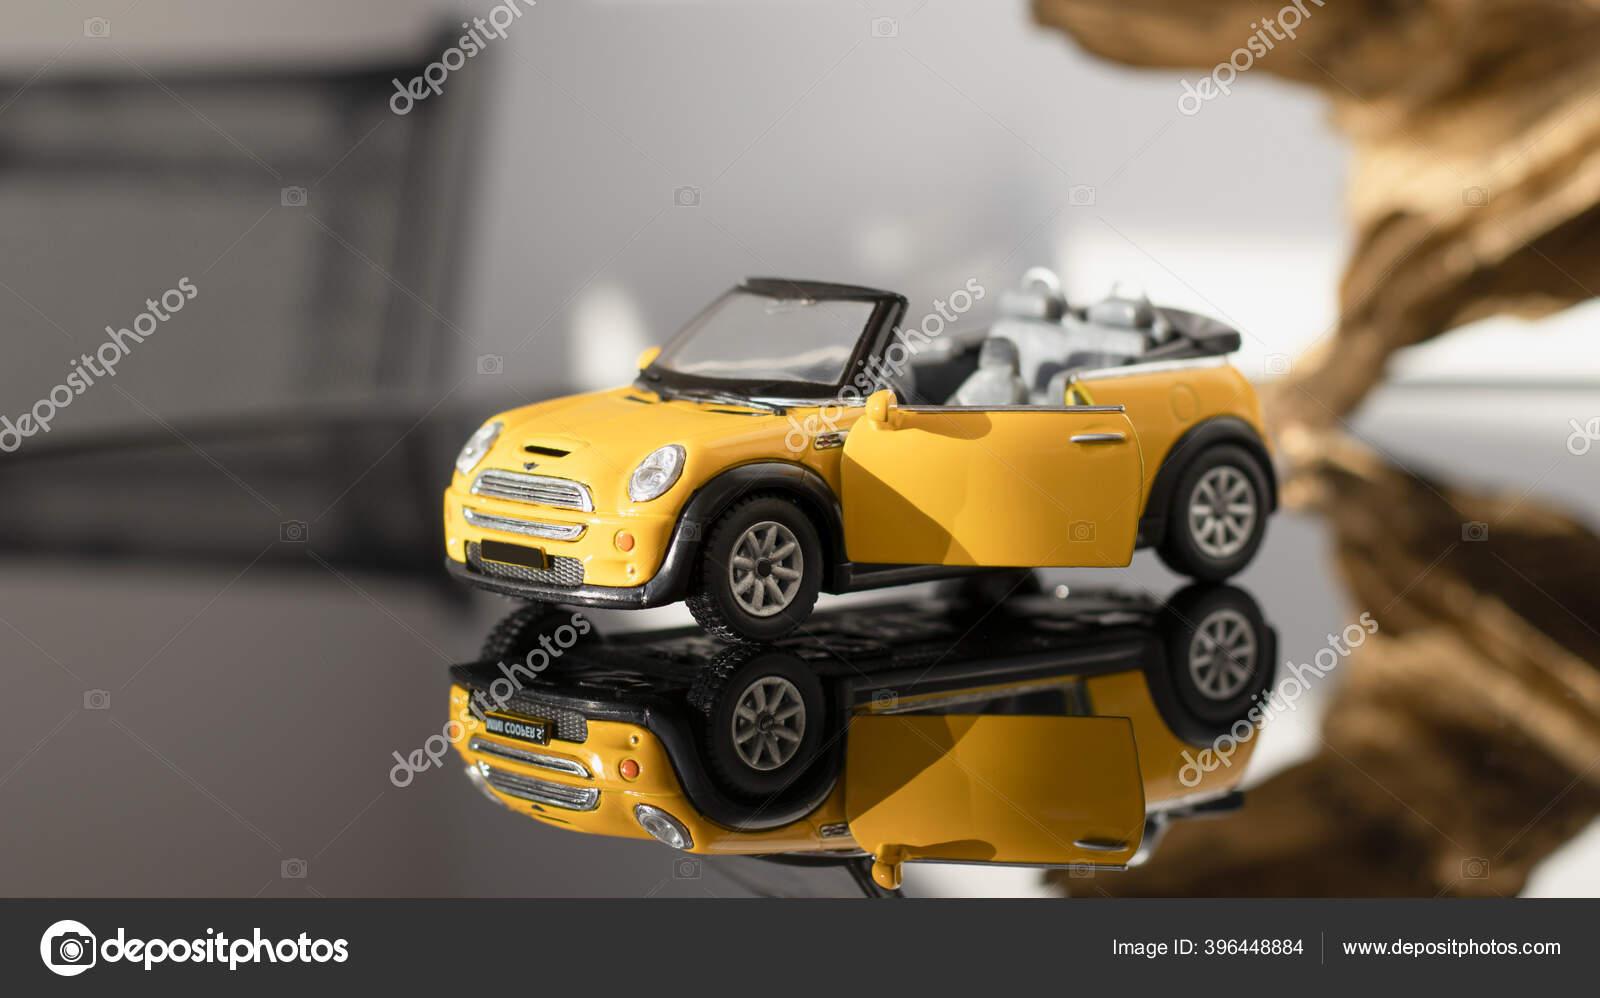 Convertible Model Yellow Mini Cooper Gray Background Yellow Toy Car Stock Editorial Photo C Vitalina G 396448884